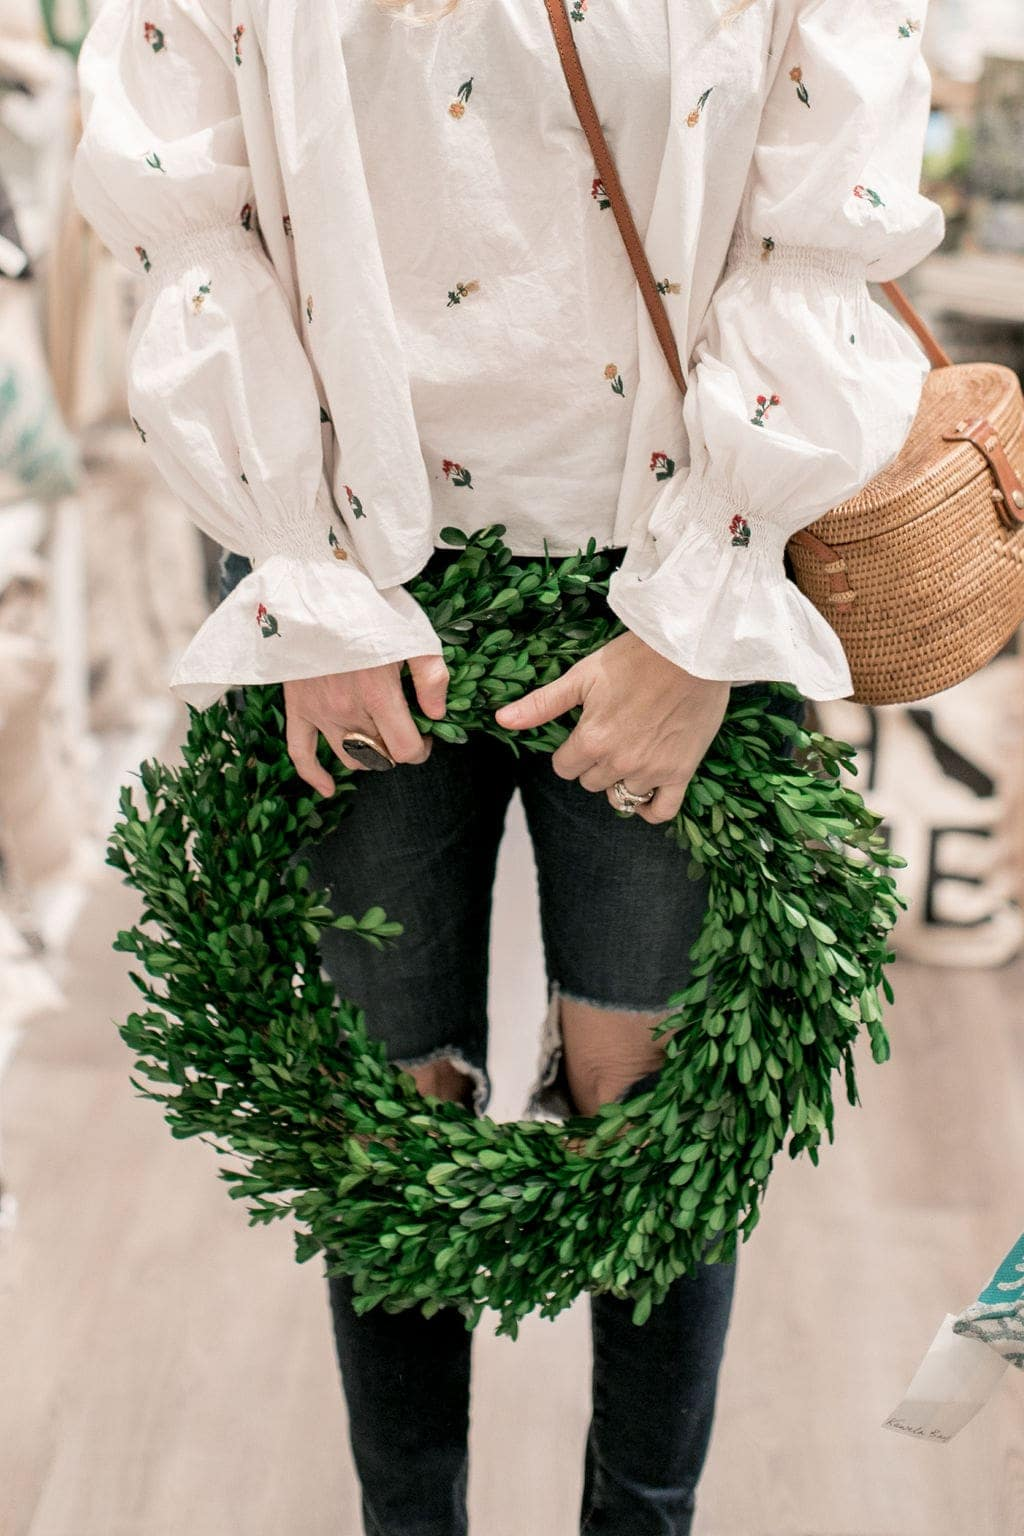 woman holding wreath